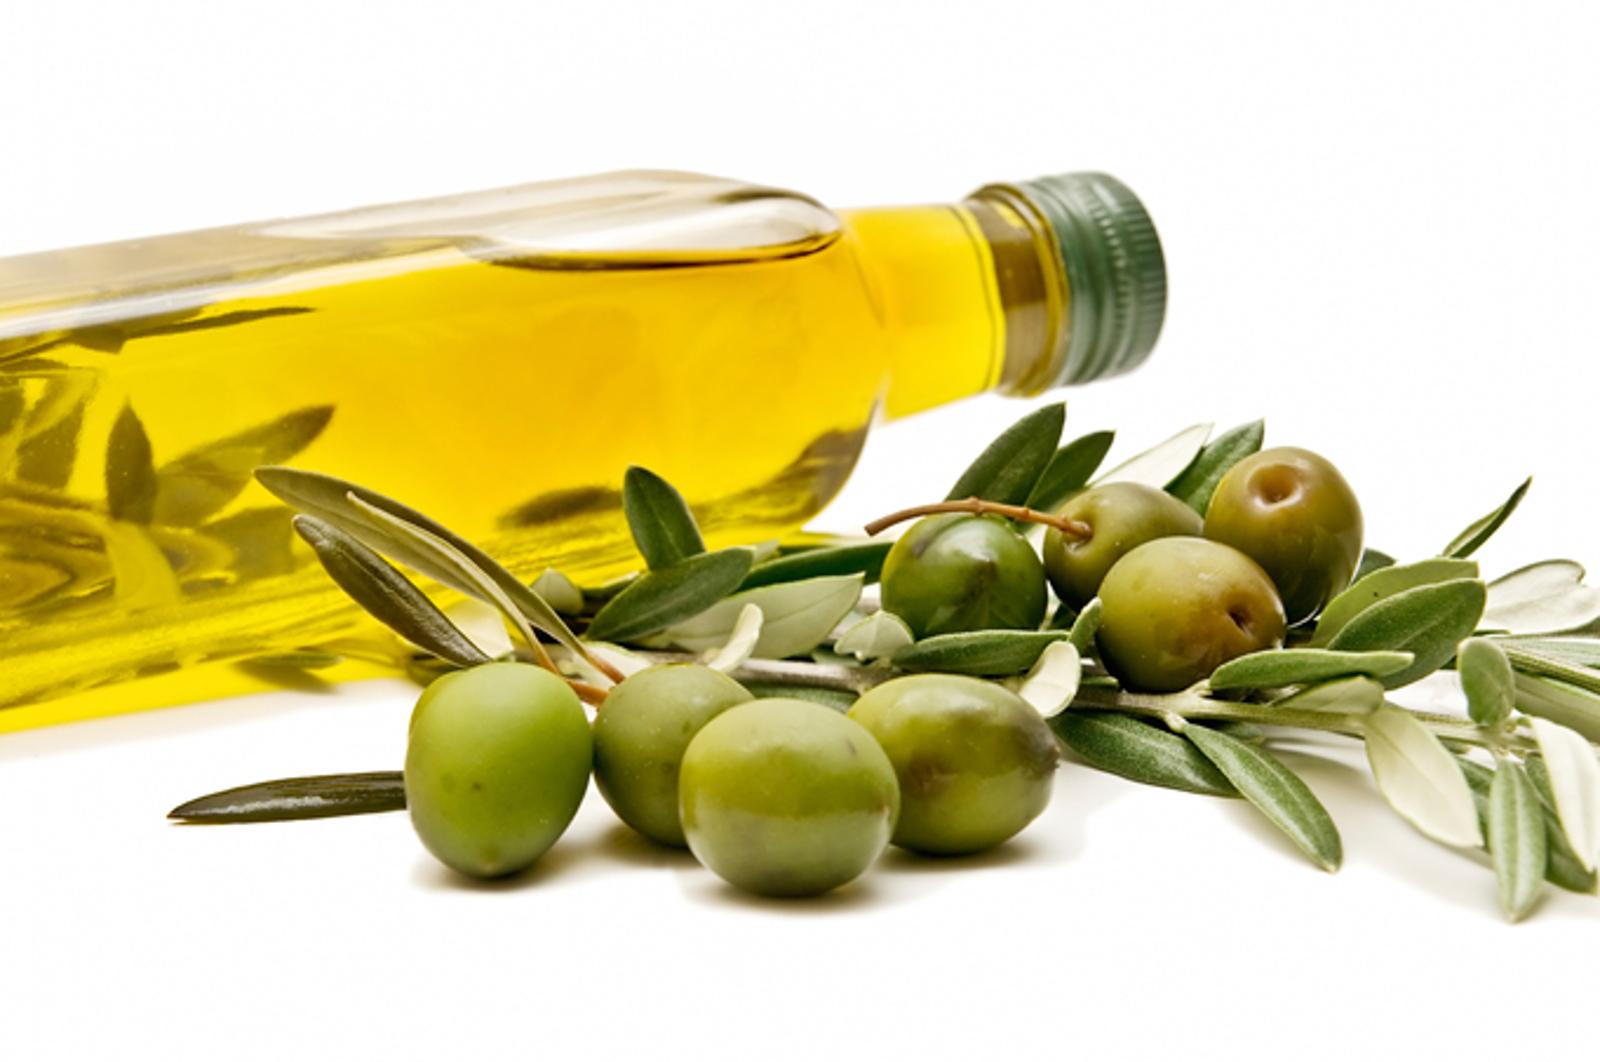 Essentials for a Mediterranean Themed Dinner